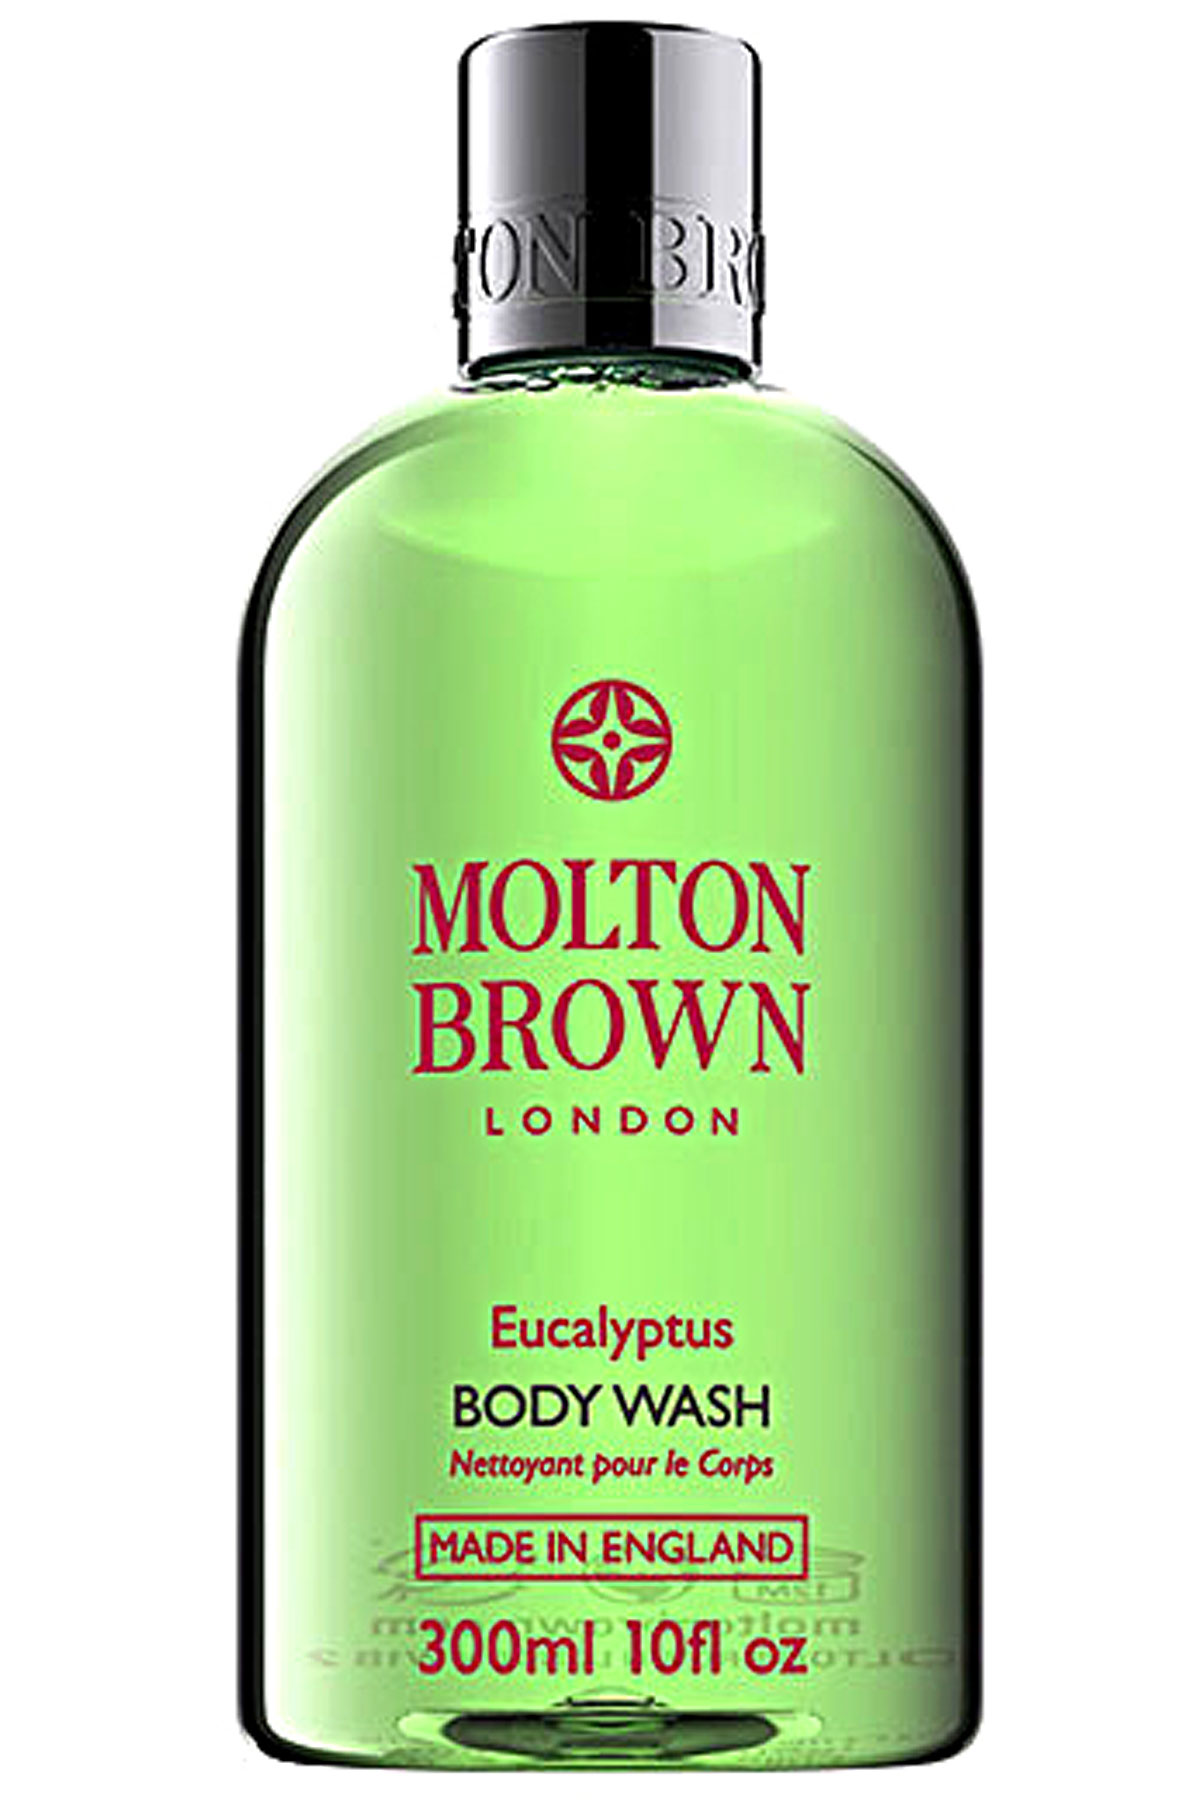 Molton Brown Beauty for Women, Eucalyptus - Body Wash - 300 Ml, 2019, 300 ml